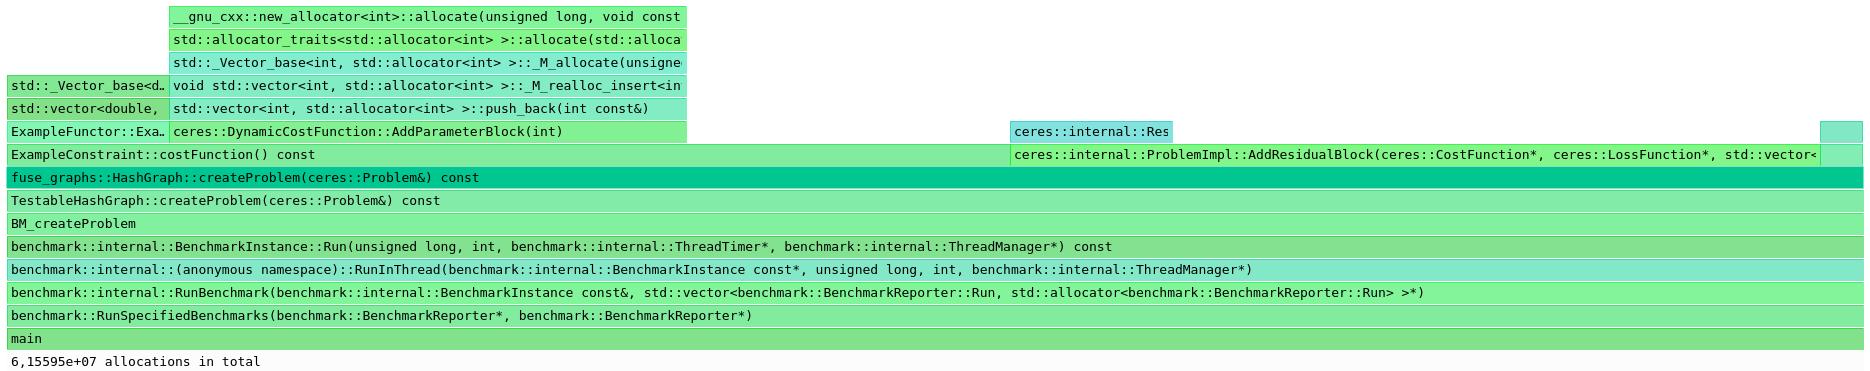 heaptrack-Screenshot from 2020-12-02 22-16-25